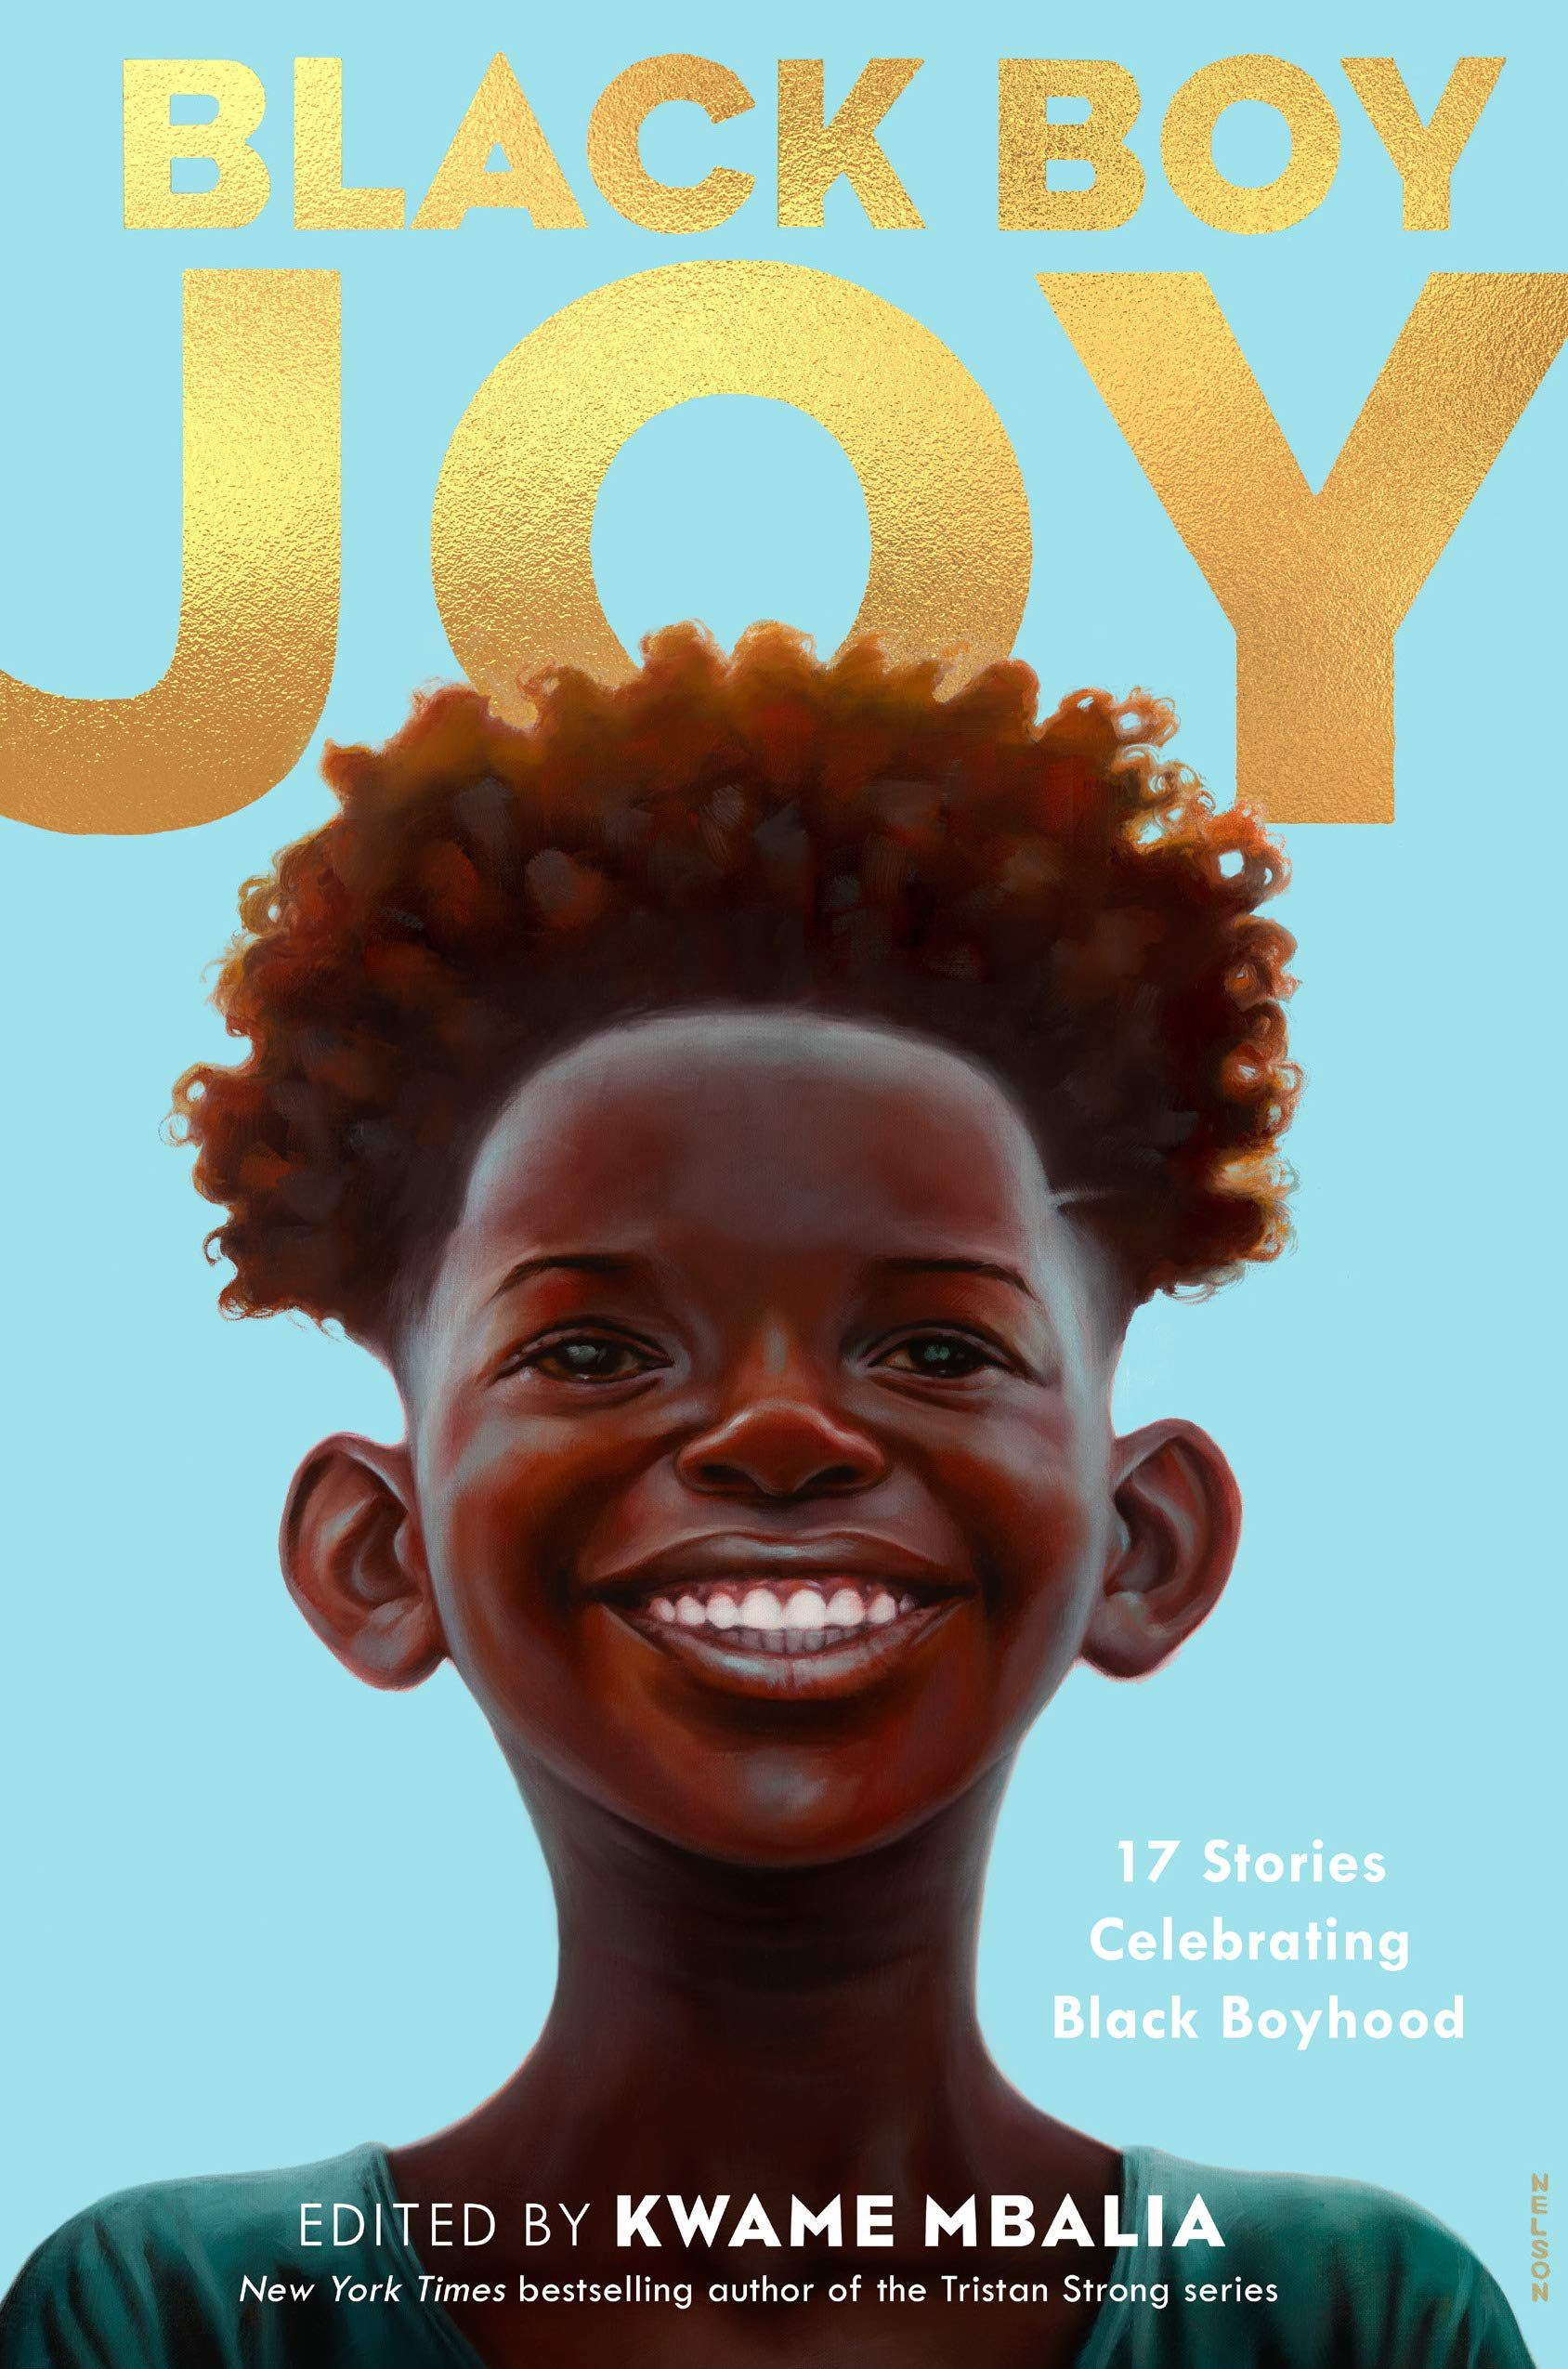 Cover of Black Boy Joy by Mbalia